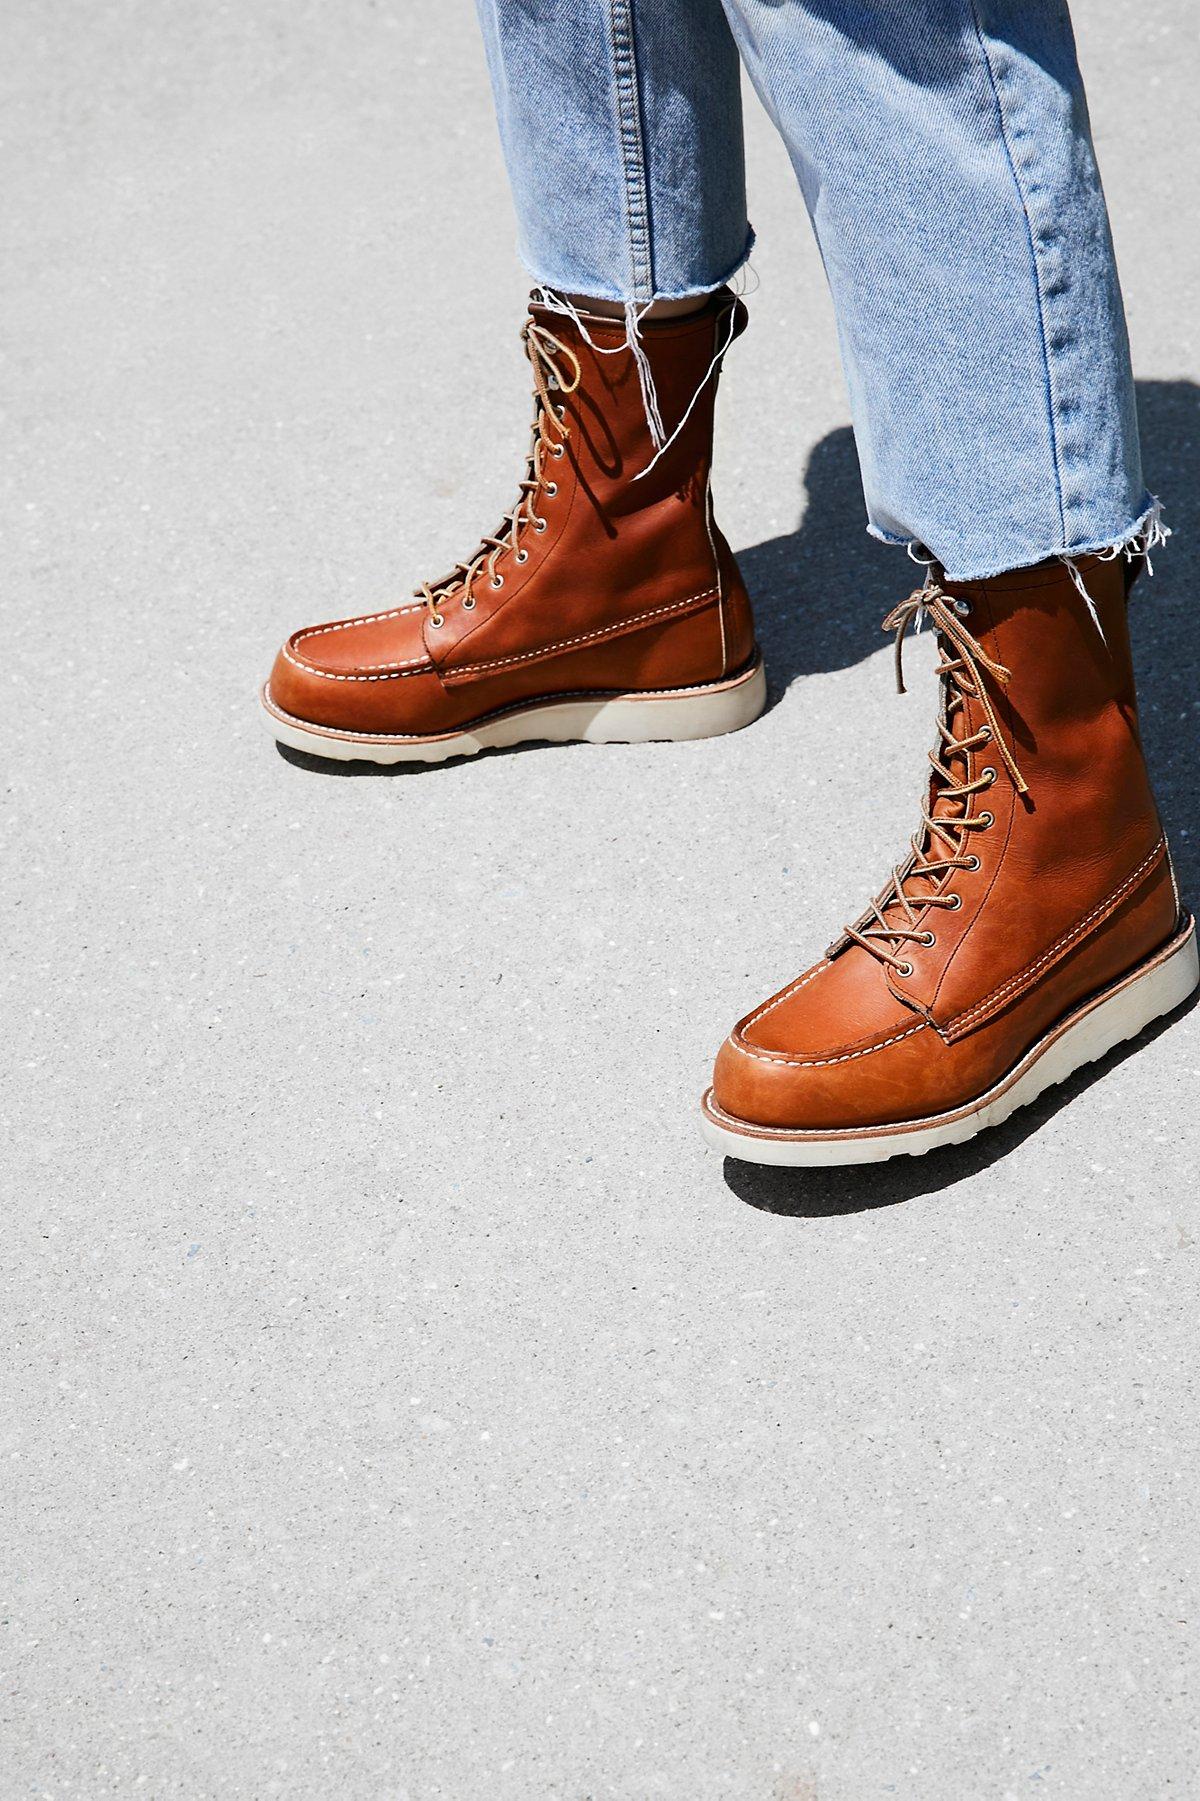 Red Wing经典莫卡辛靴